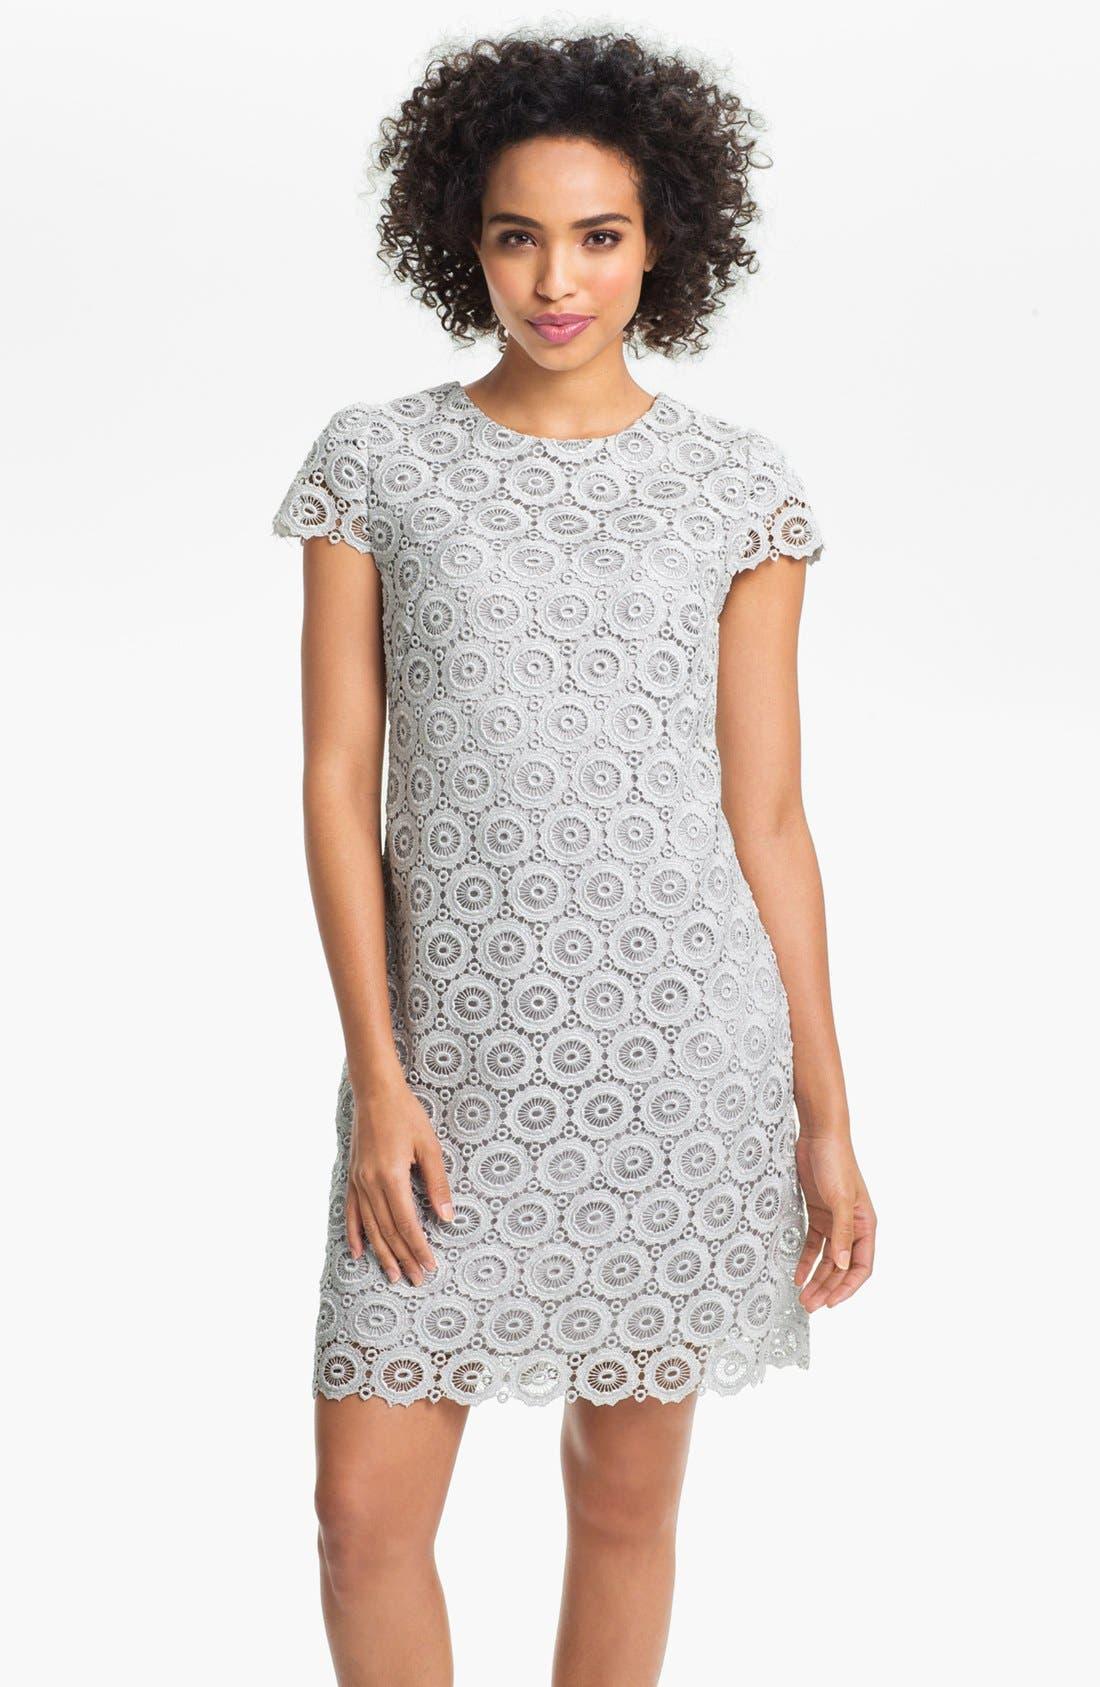 Main Image - Suzi Chin for Maggy Boutique Lace Shift Dress (Petite)